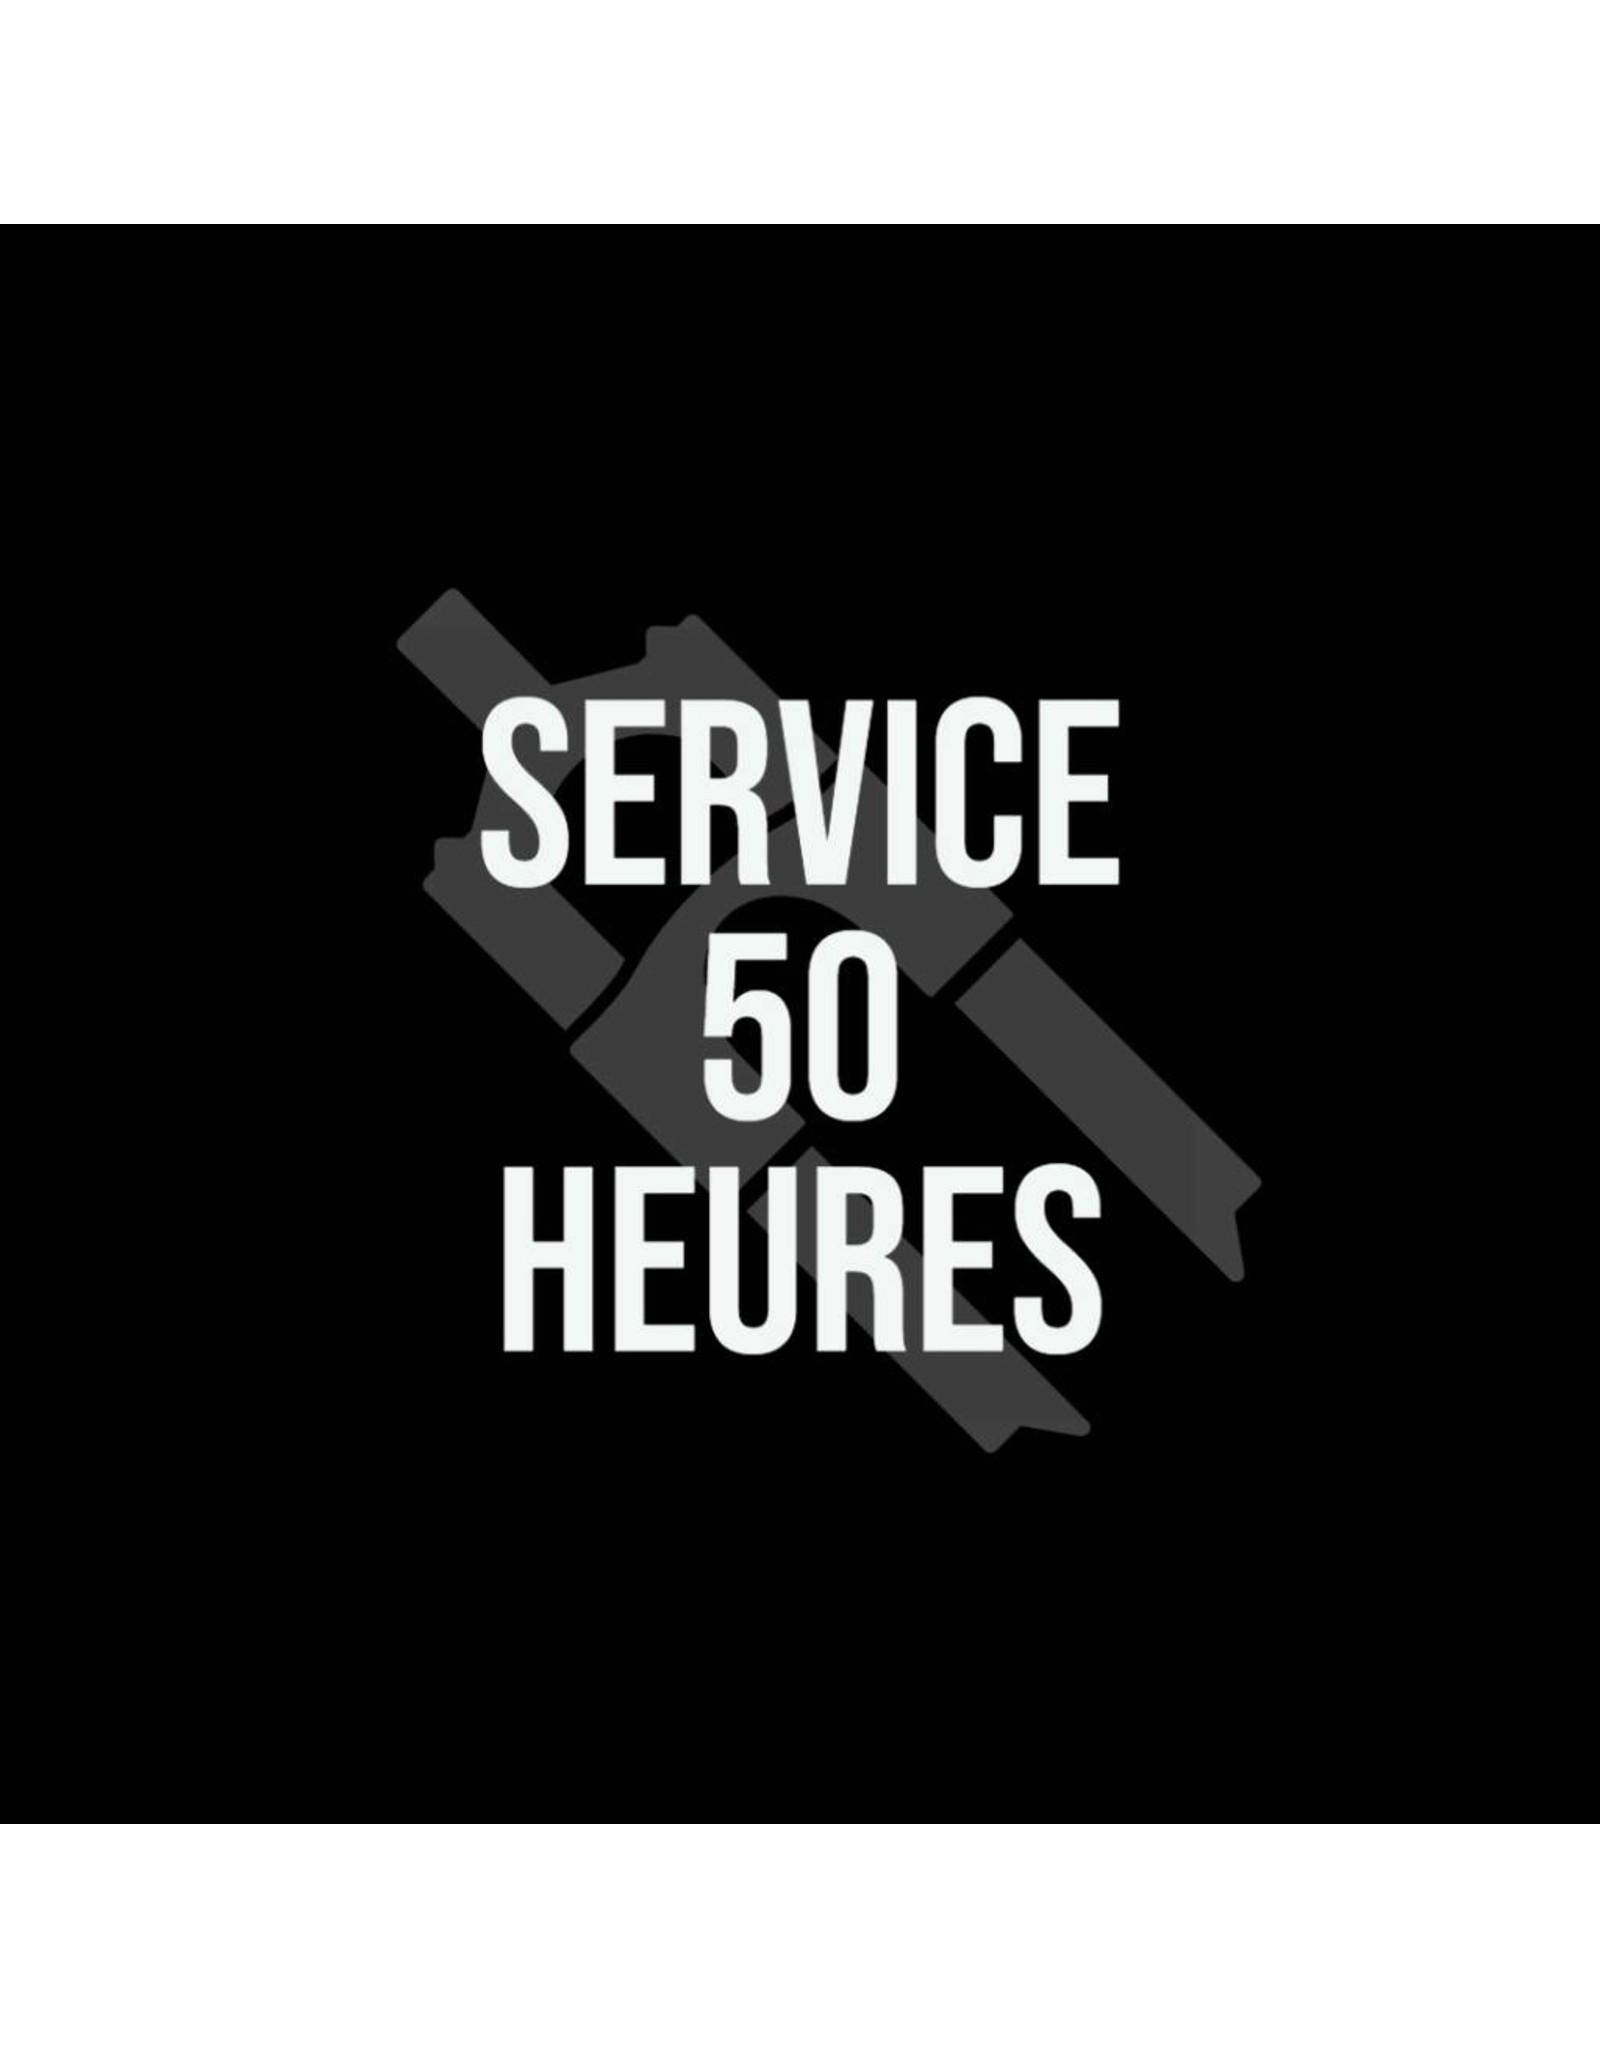 Service 50 hrs